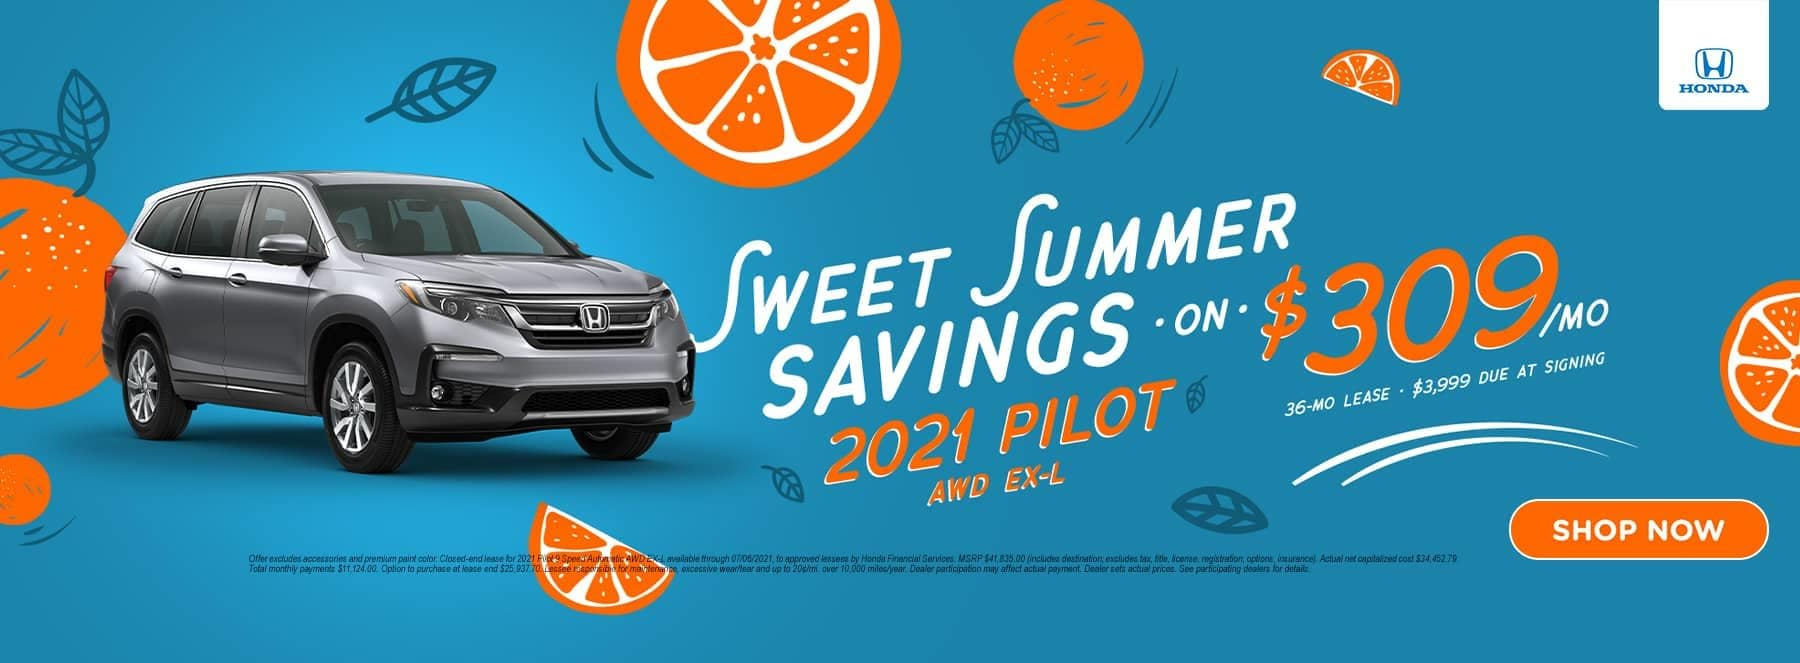 Sweet Summer Savings 2021 Pilot AWD EX-L